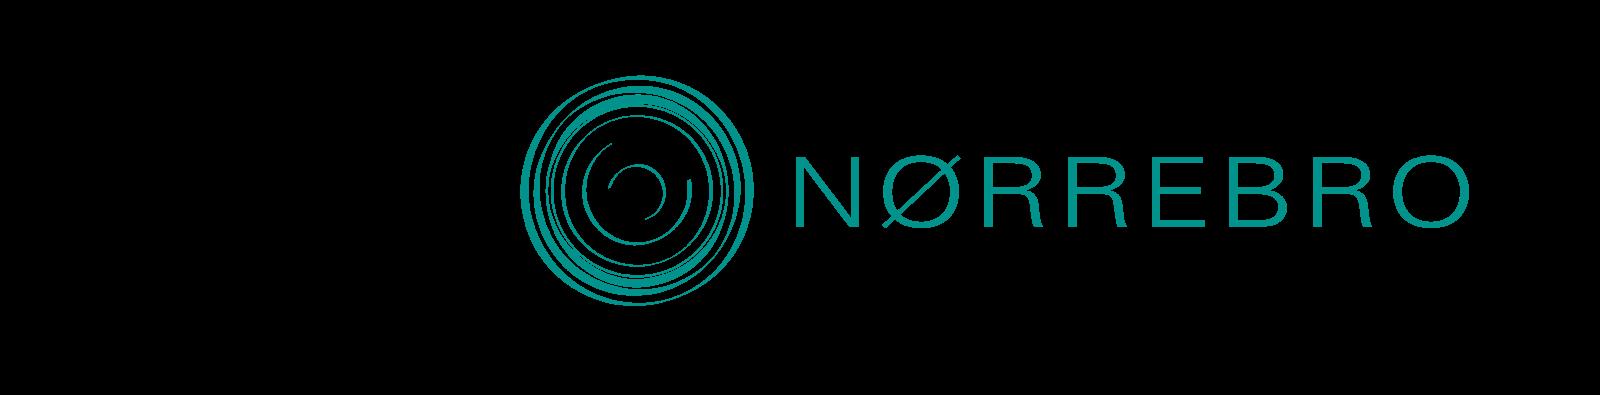 Miljøpunkt Nørrebro logo